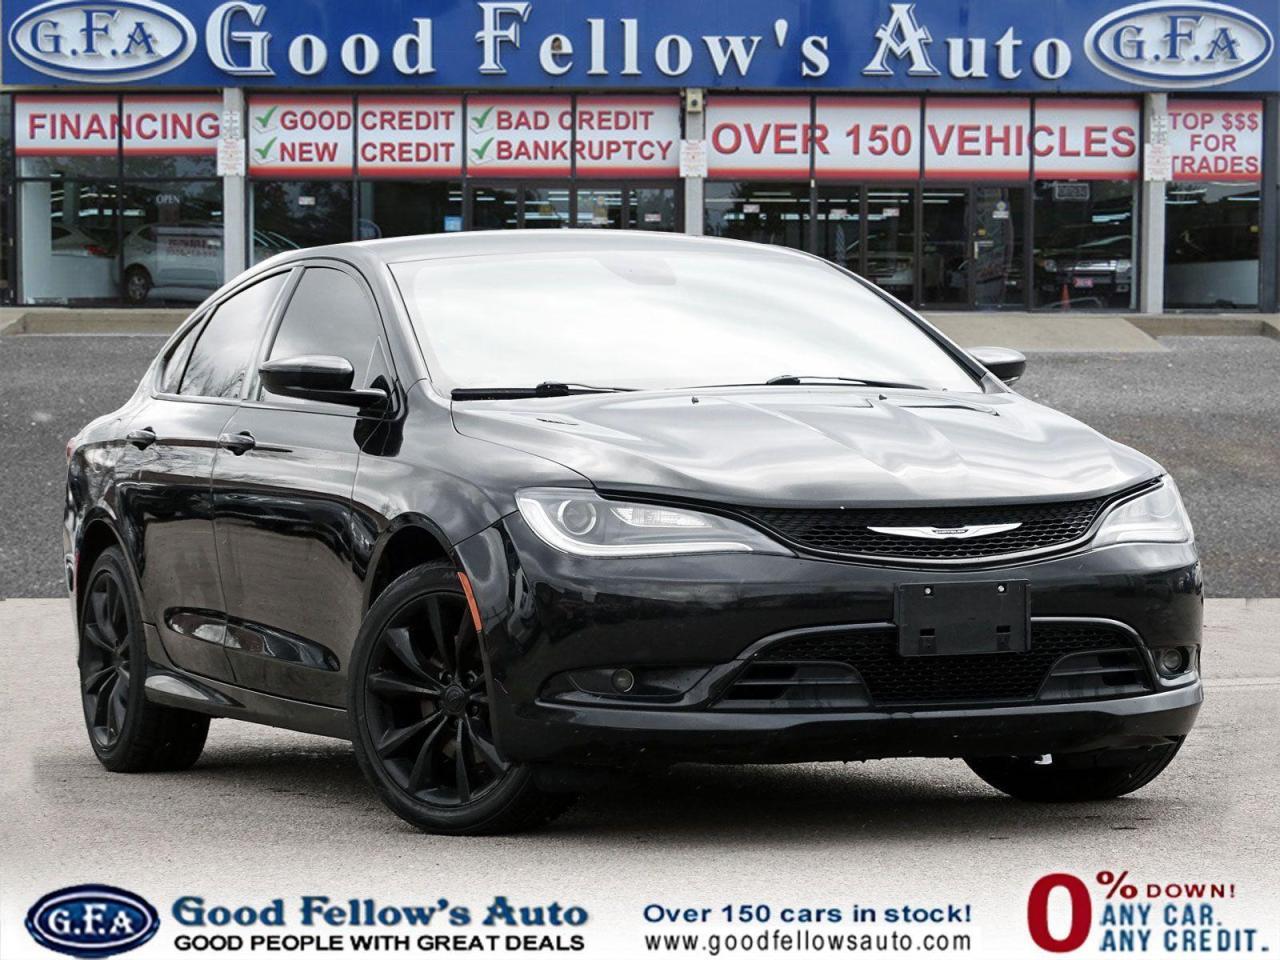 used 2015 Chrysler 200 car, priced at $8,900